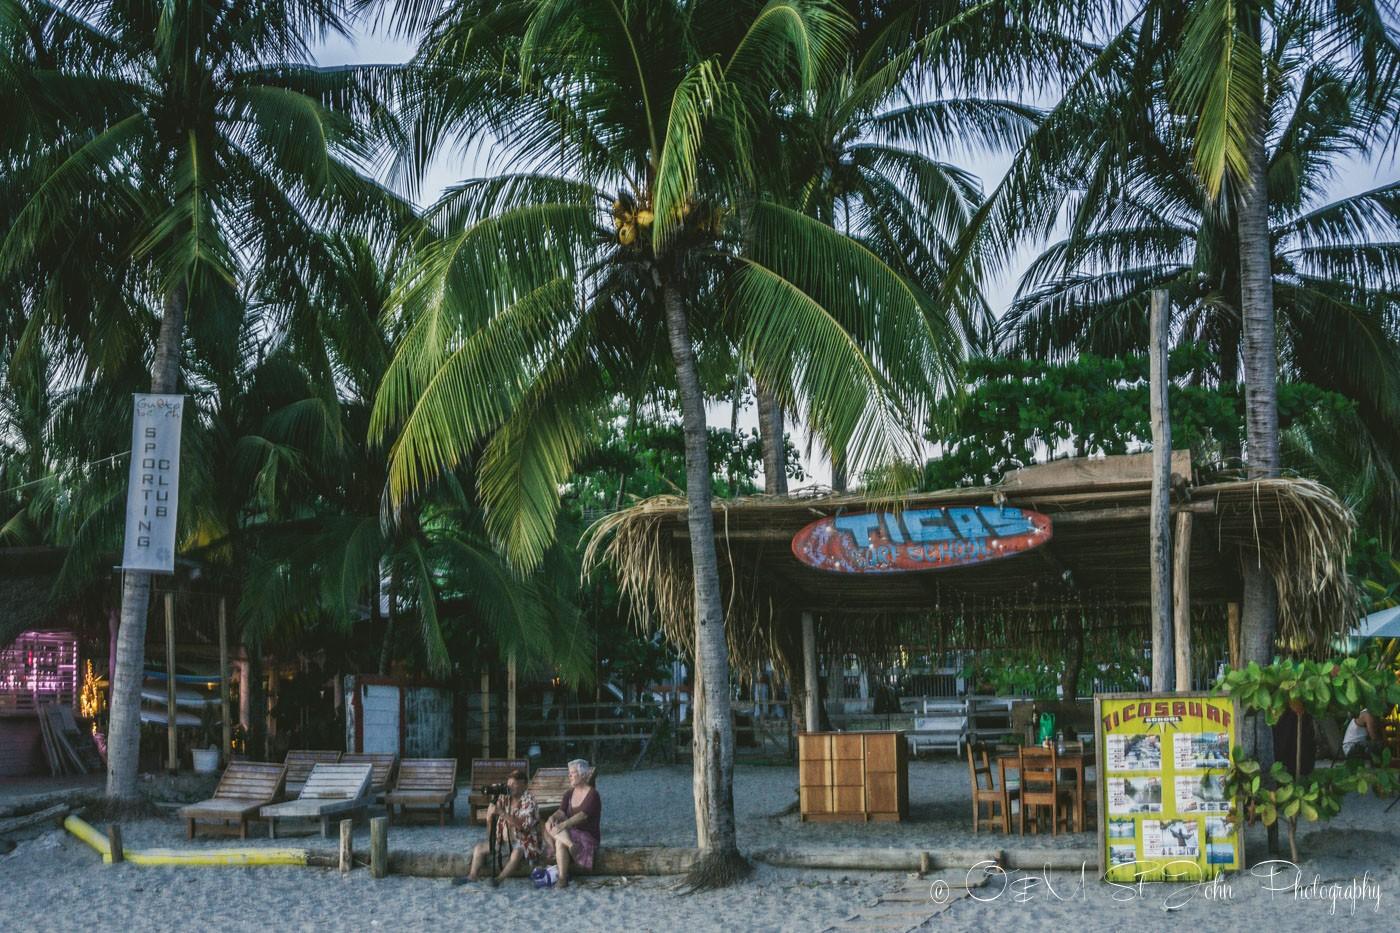 Ticos Surf School on the beach in Samara Costa Rica